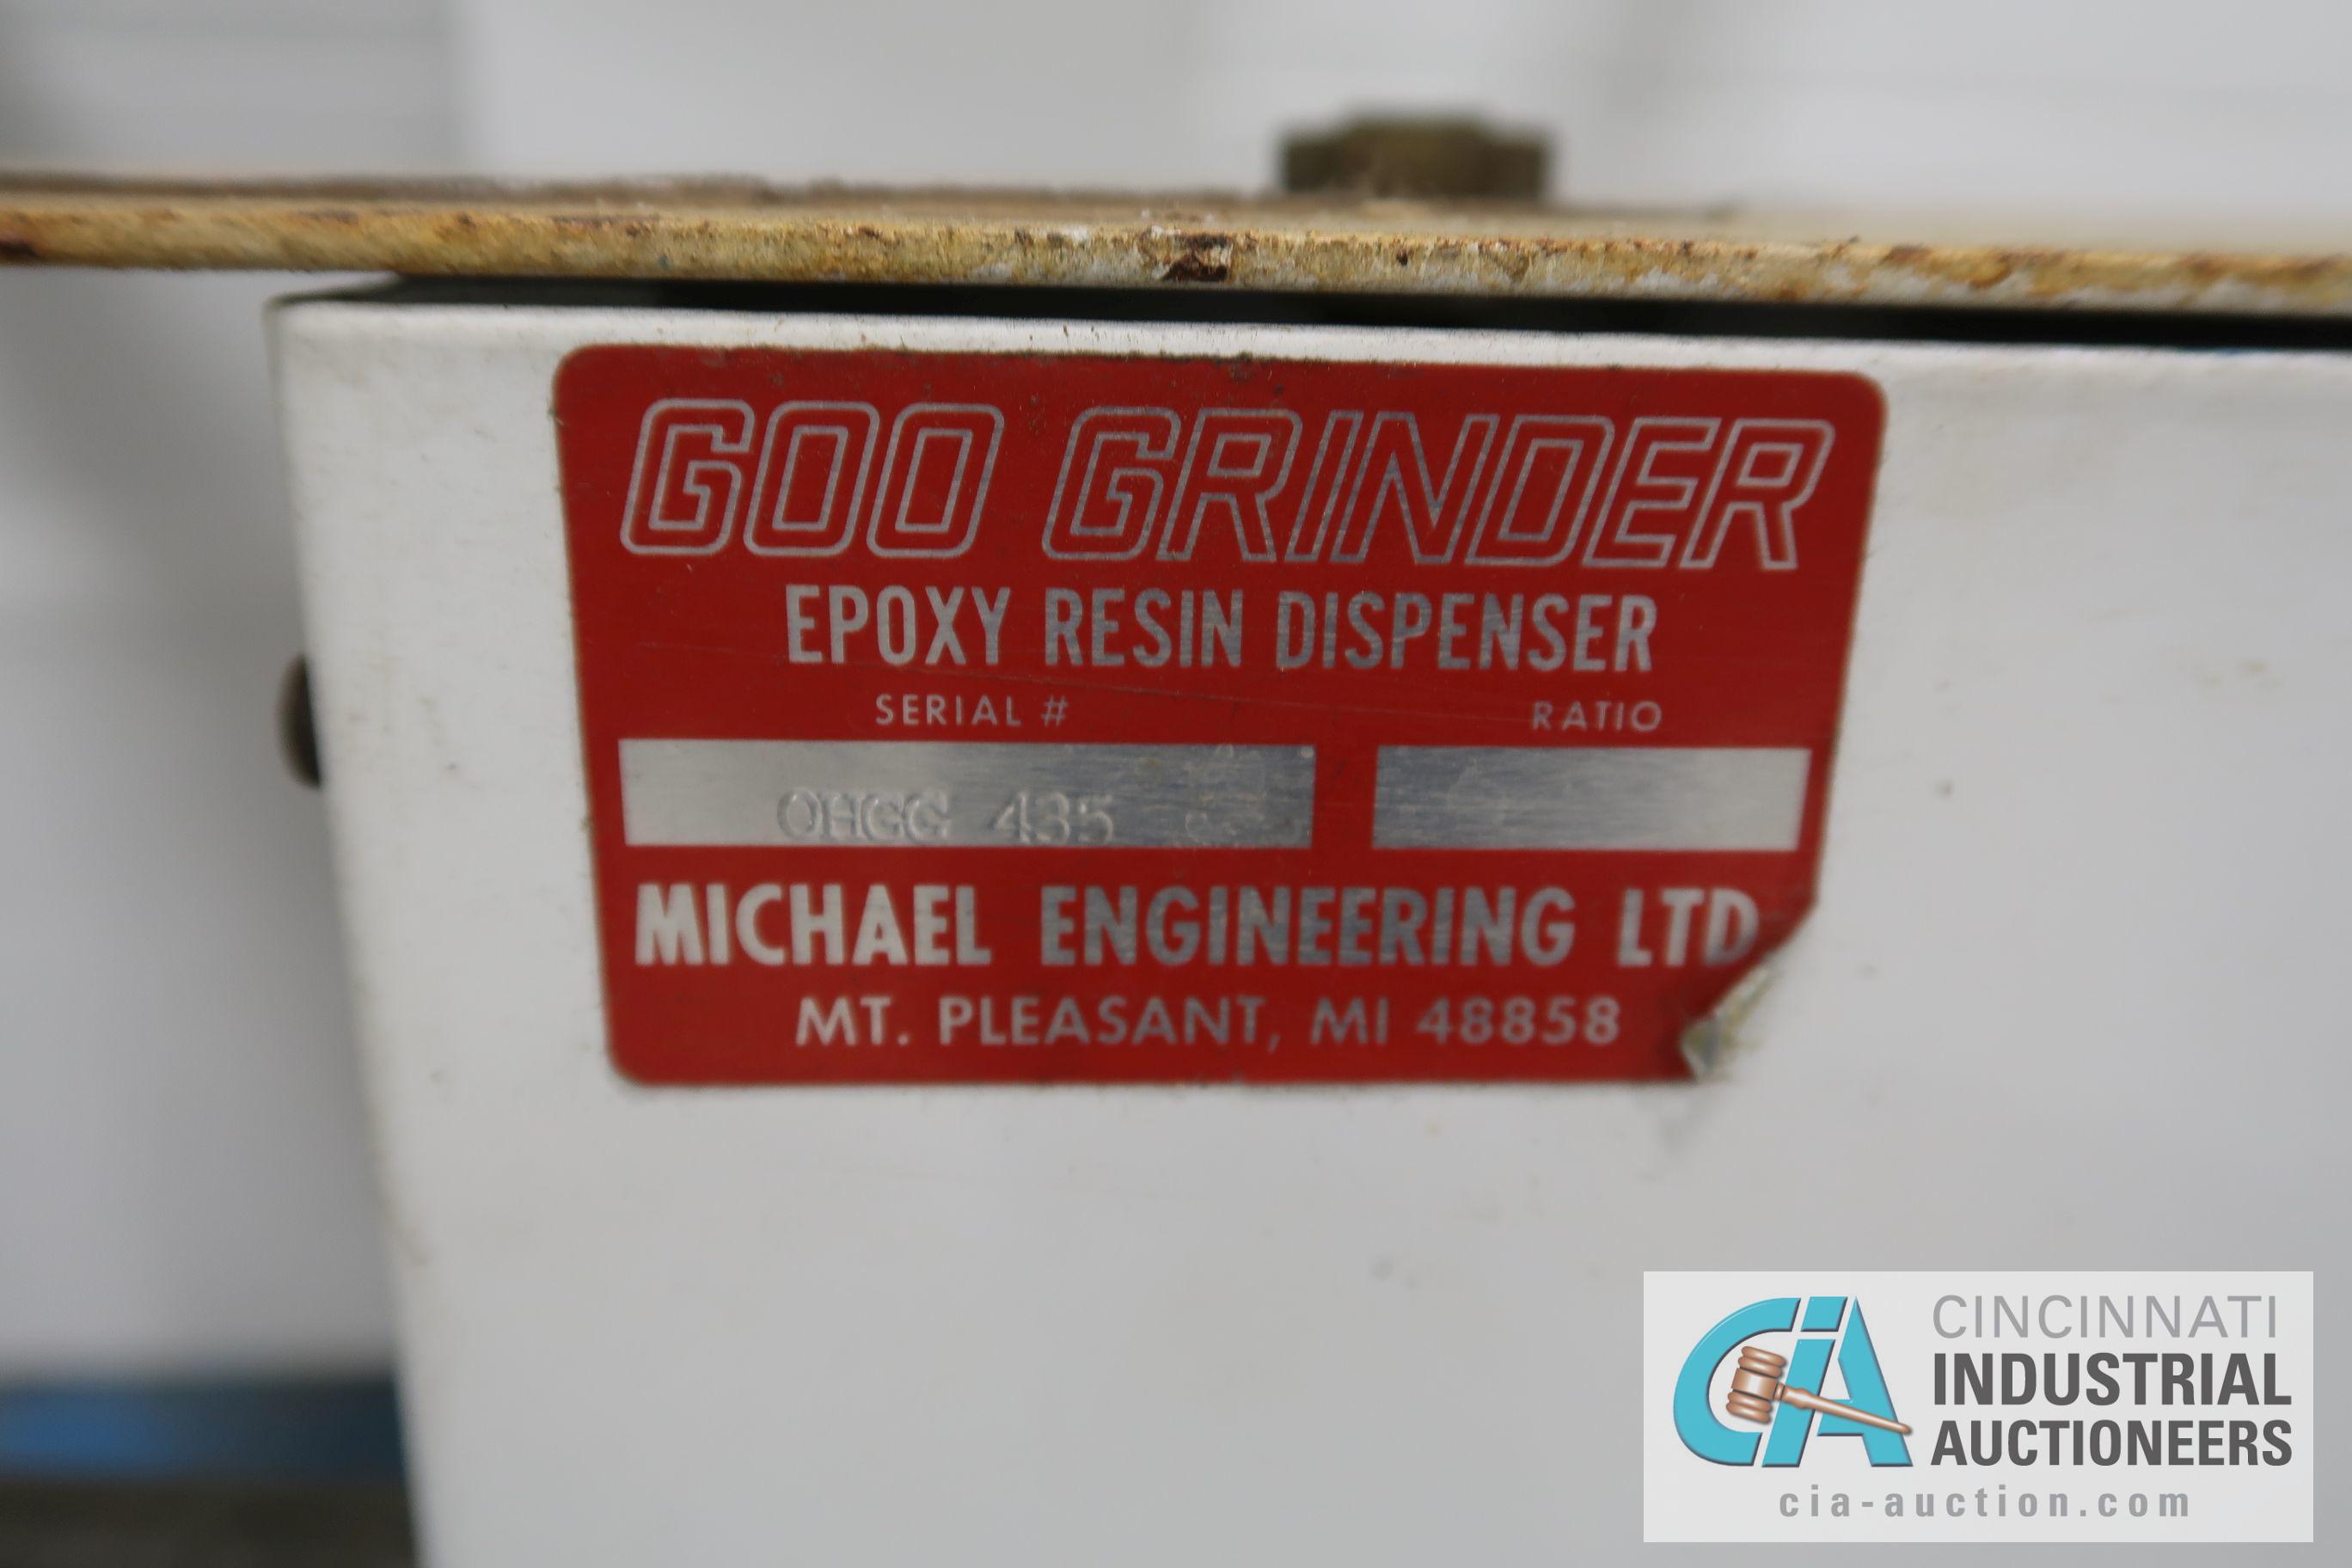 GOO GRINDER EPOXY RESIN DISPENSER - Image 2 of 3